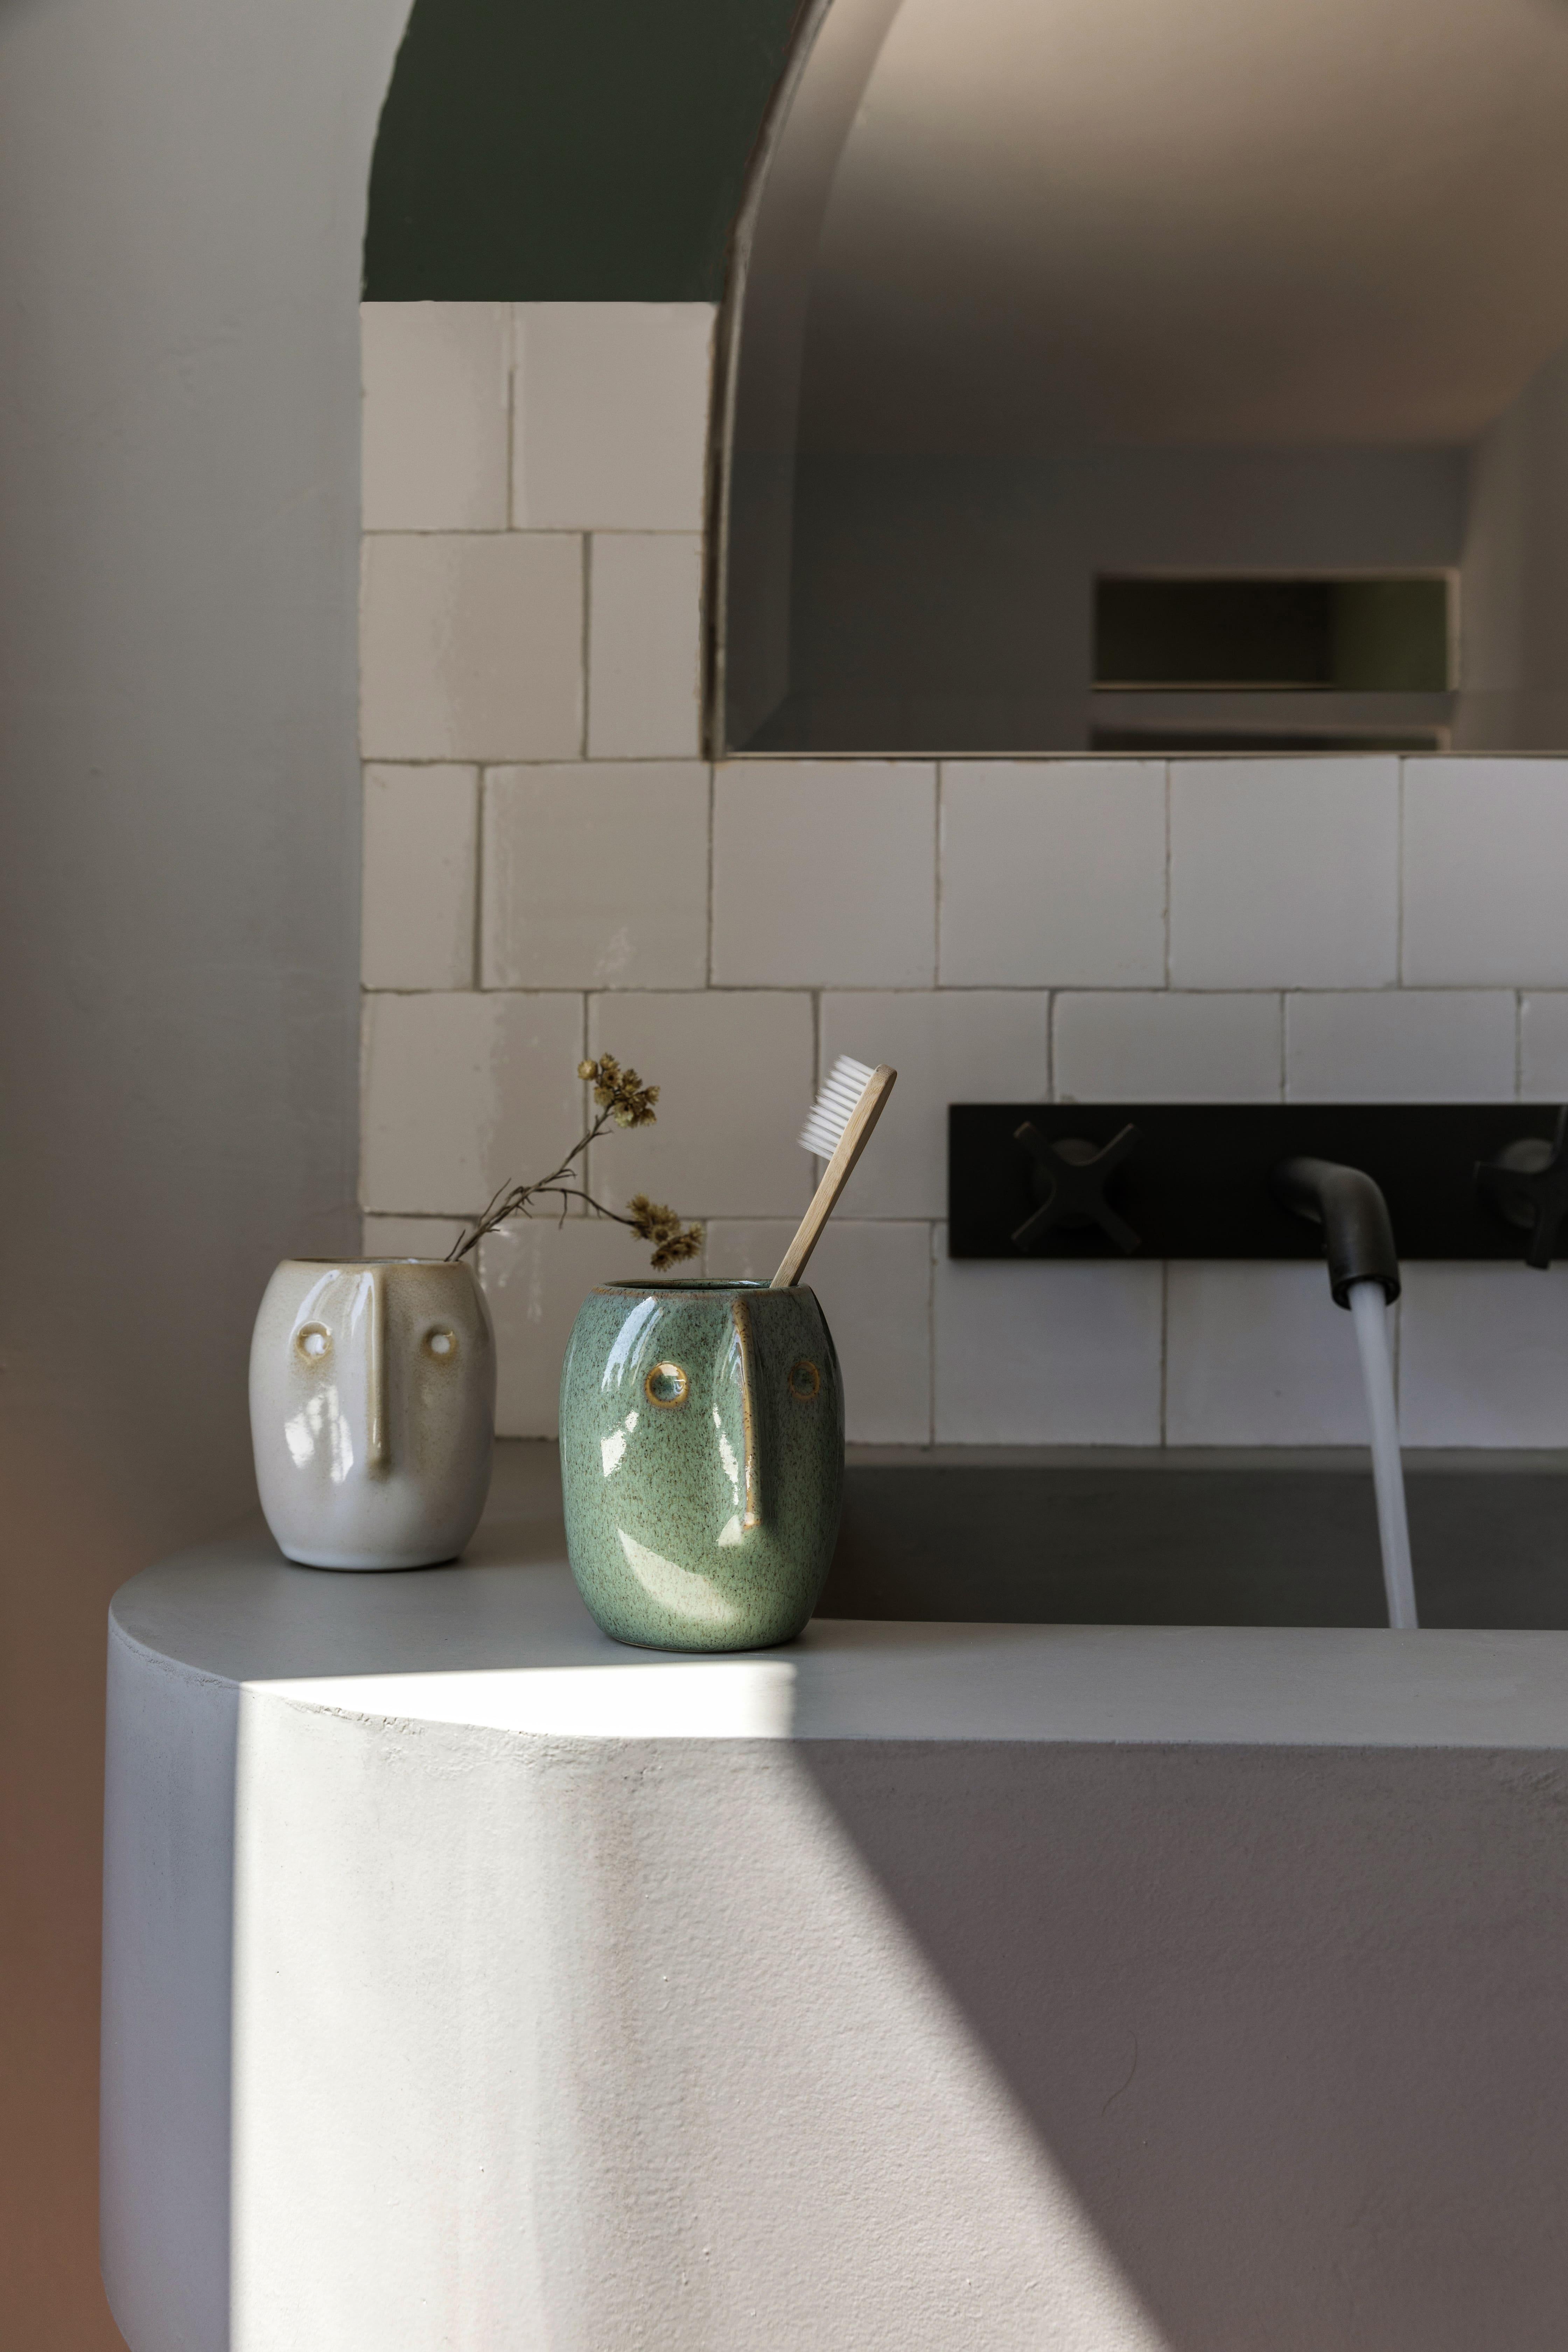 Habitación Son Bou 5 hotel experimental de Menorca